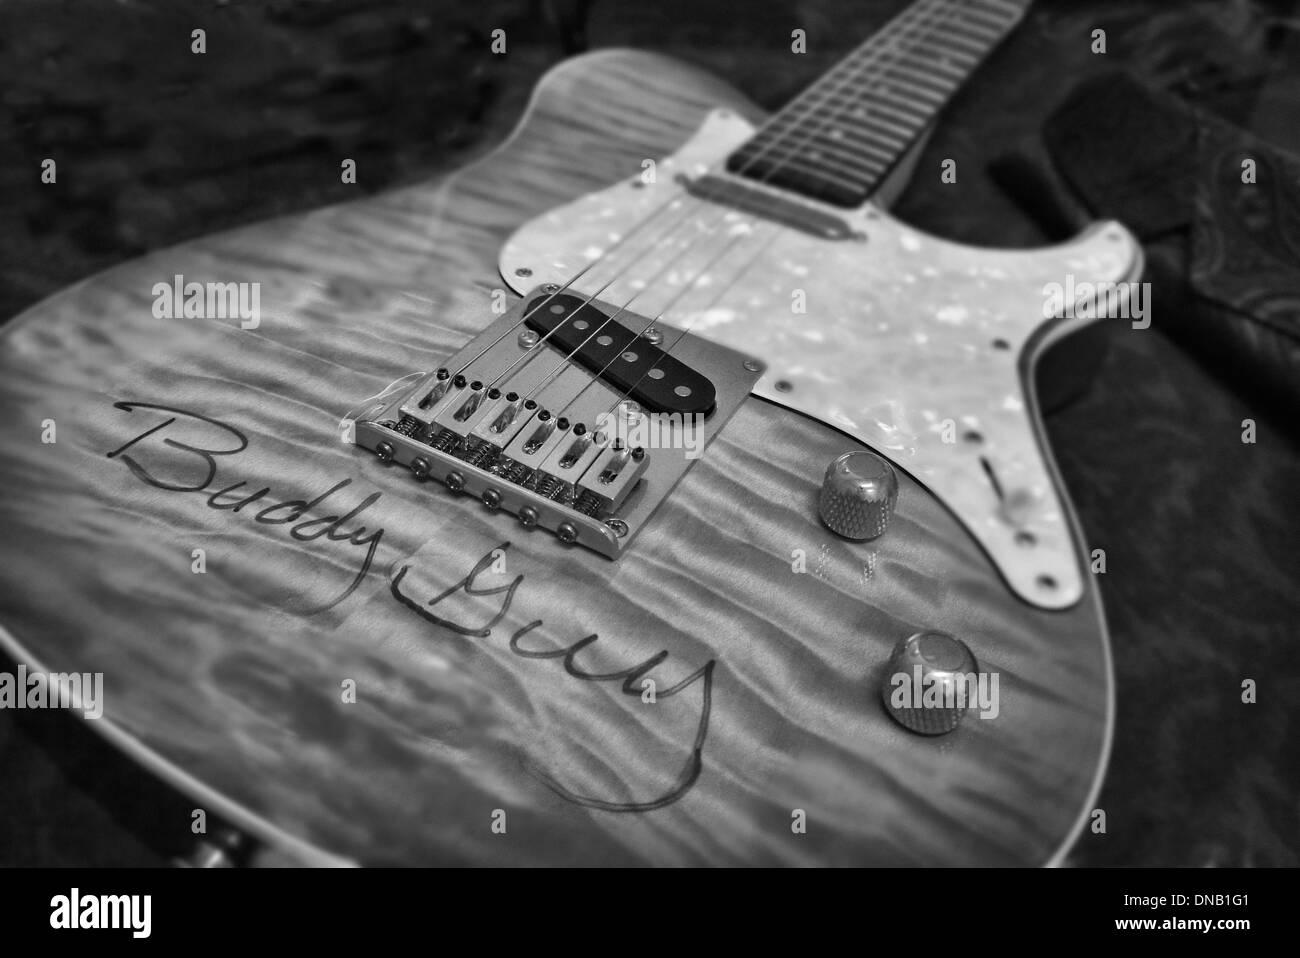 Buddy Guy's Guitar - Stock Image